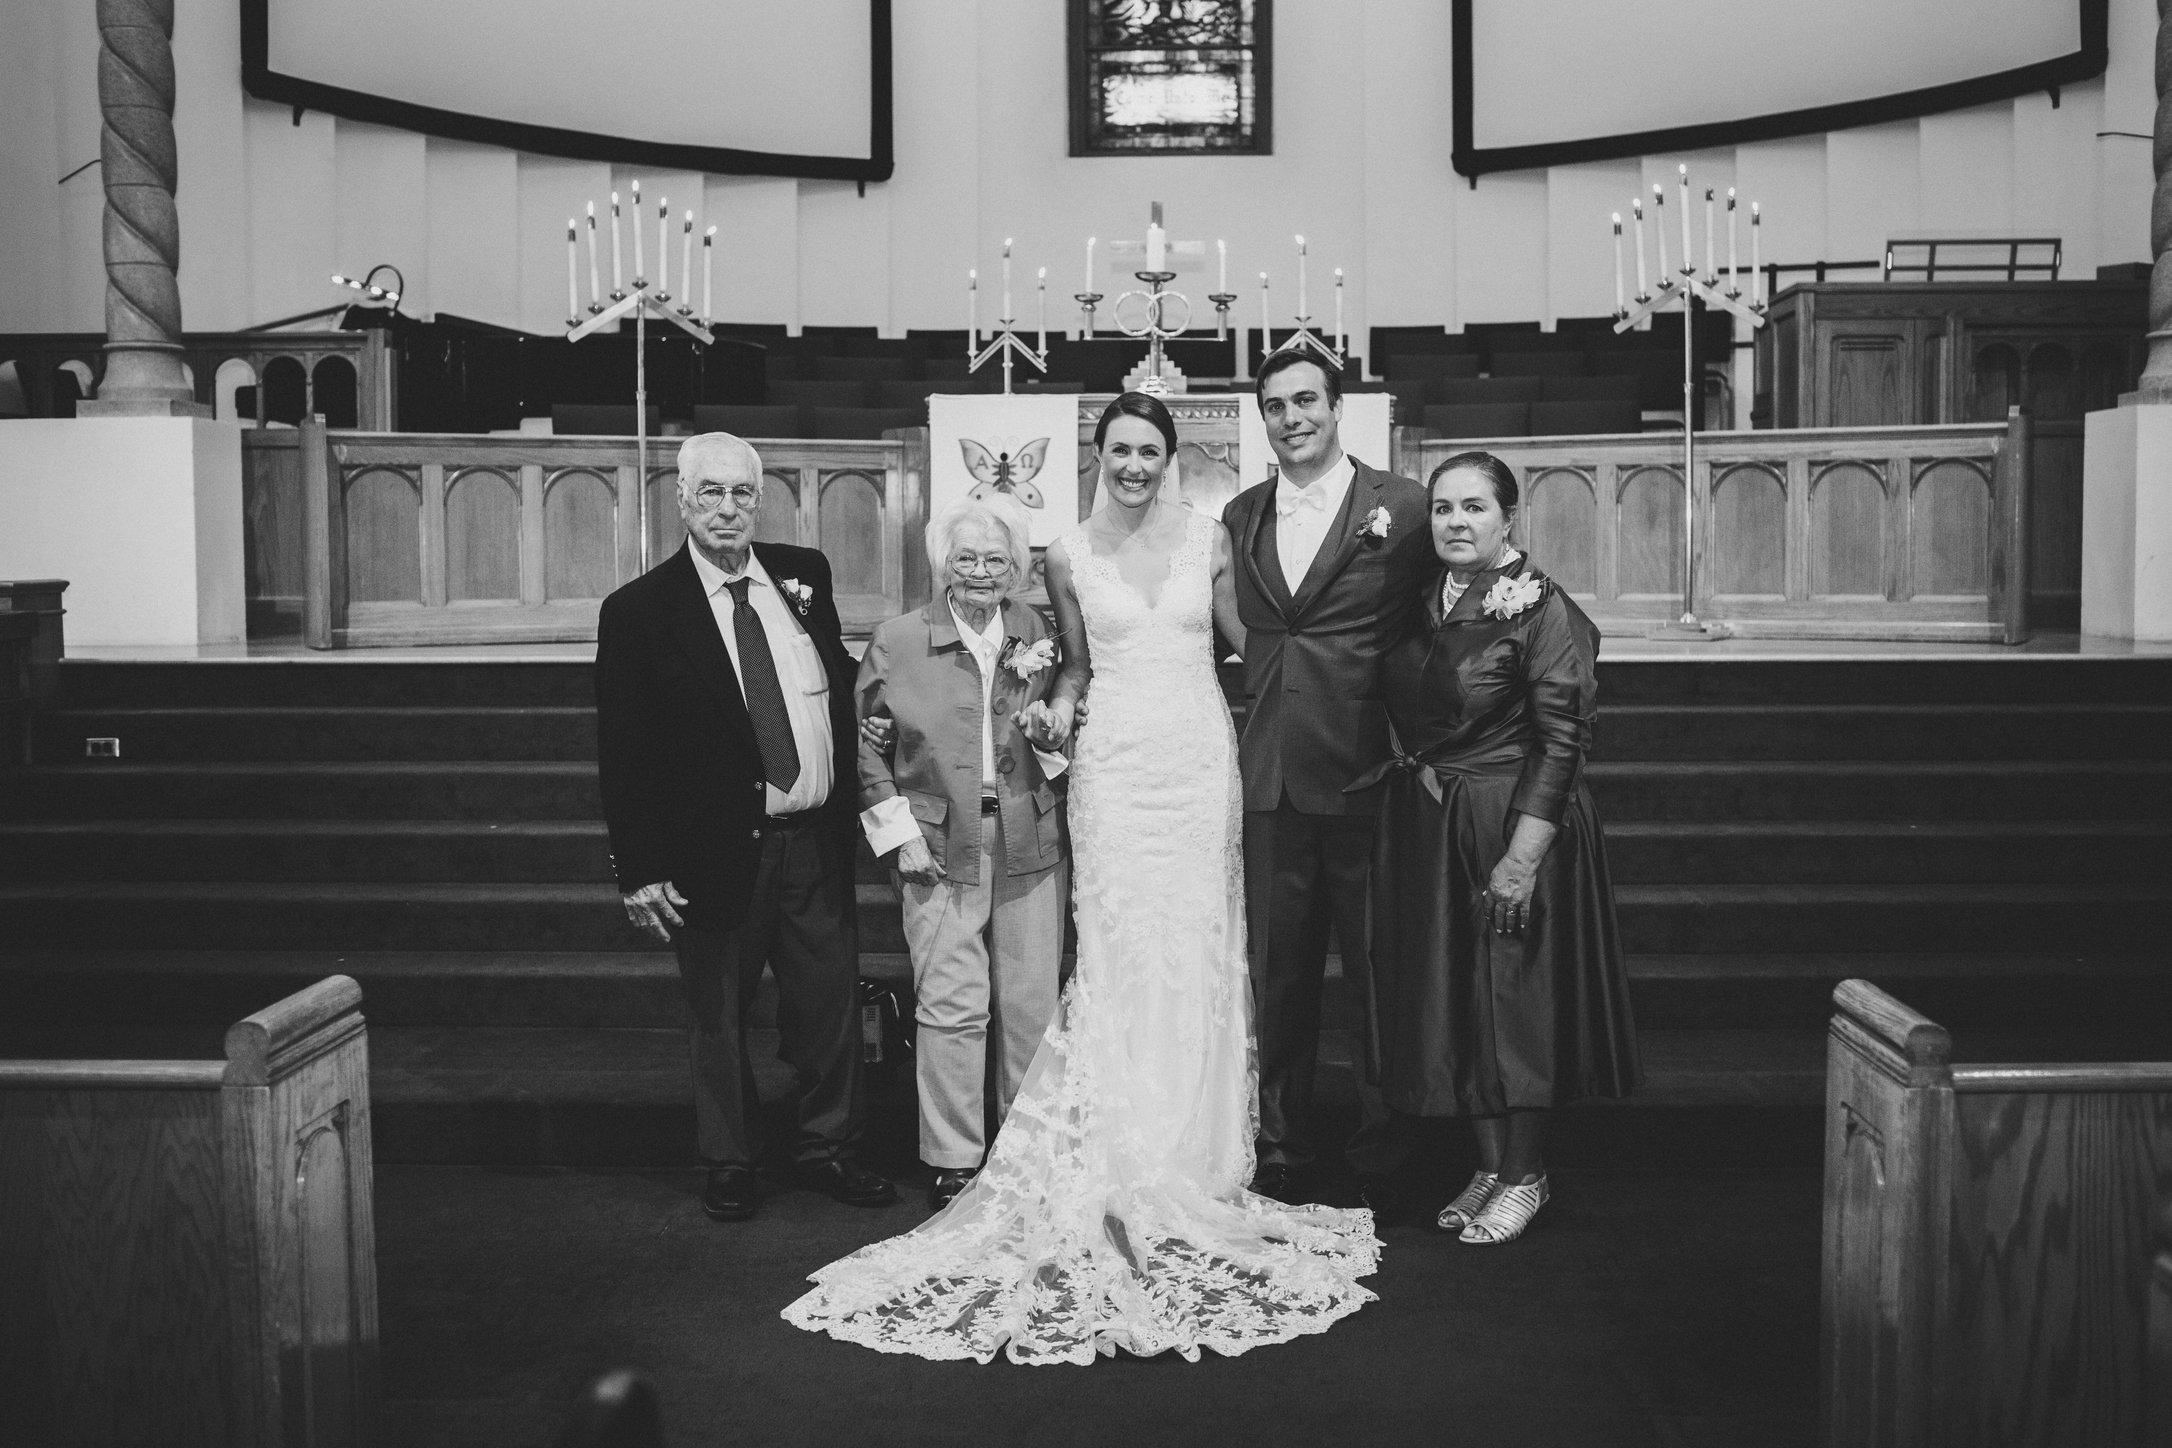 SandC-wedding-279.jpg